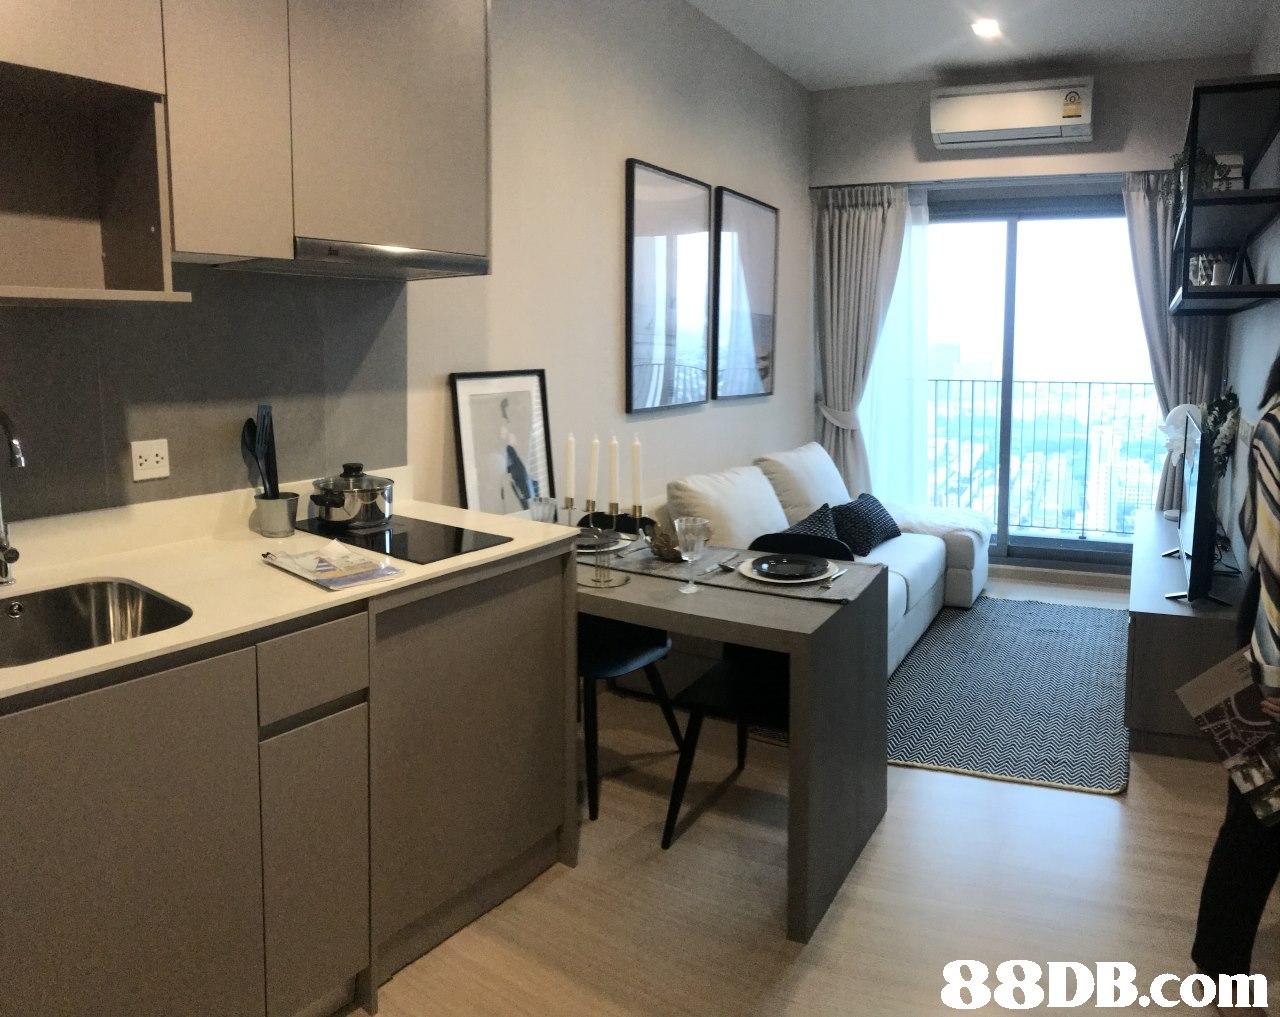 Room,Property,Furniture,Building,Interior design